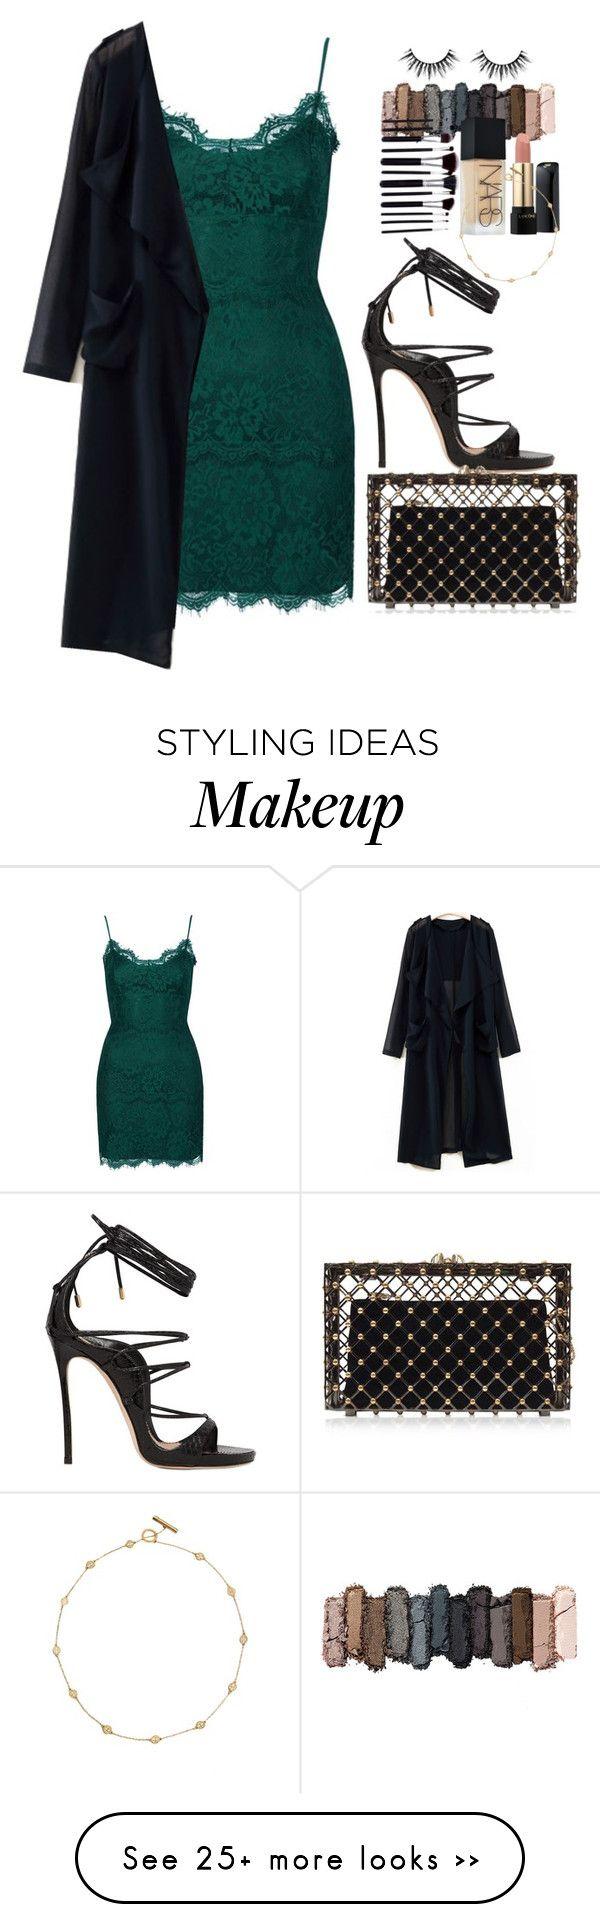 Hipster Fashion: Makeup Beauty Sets